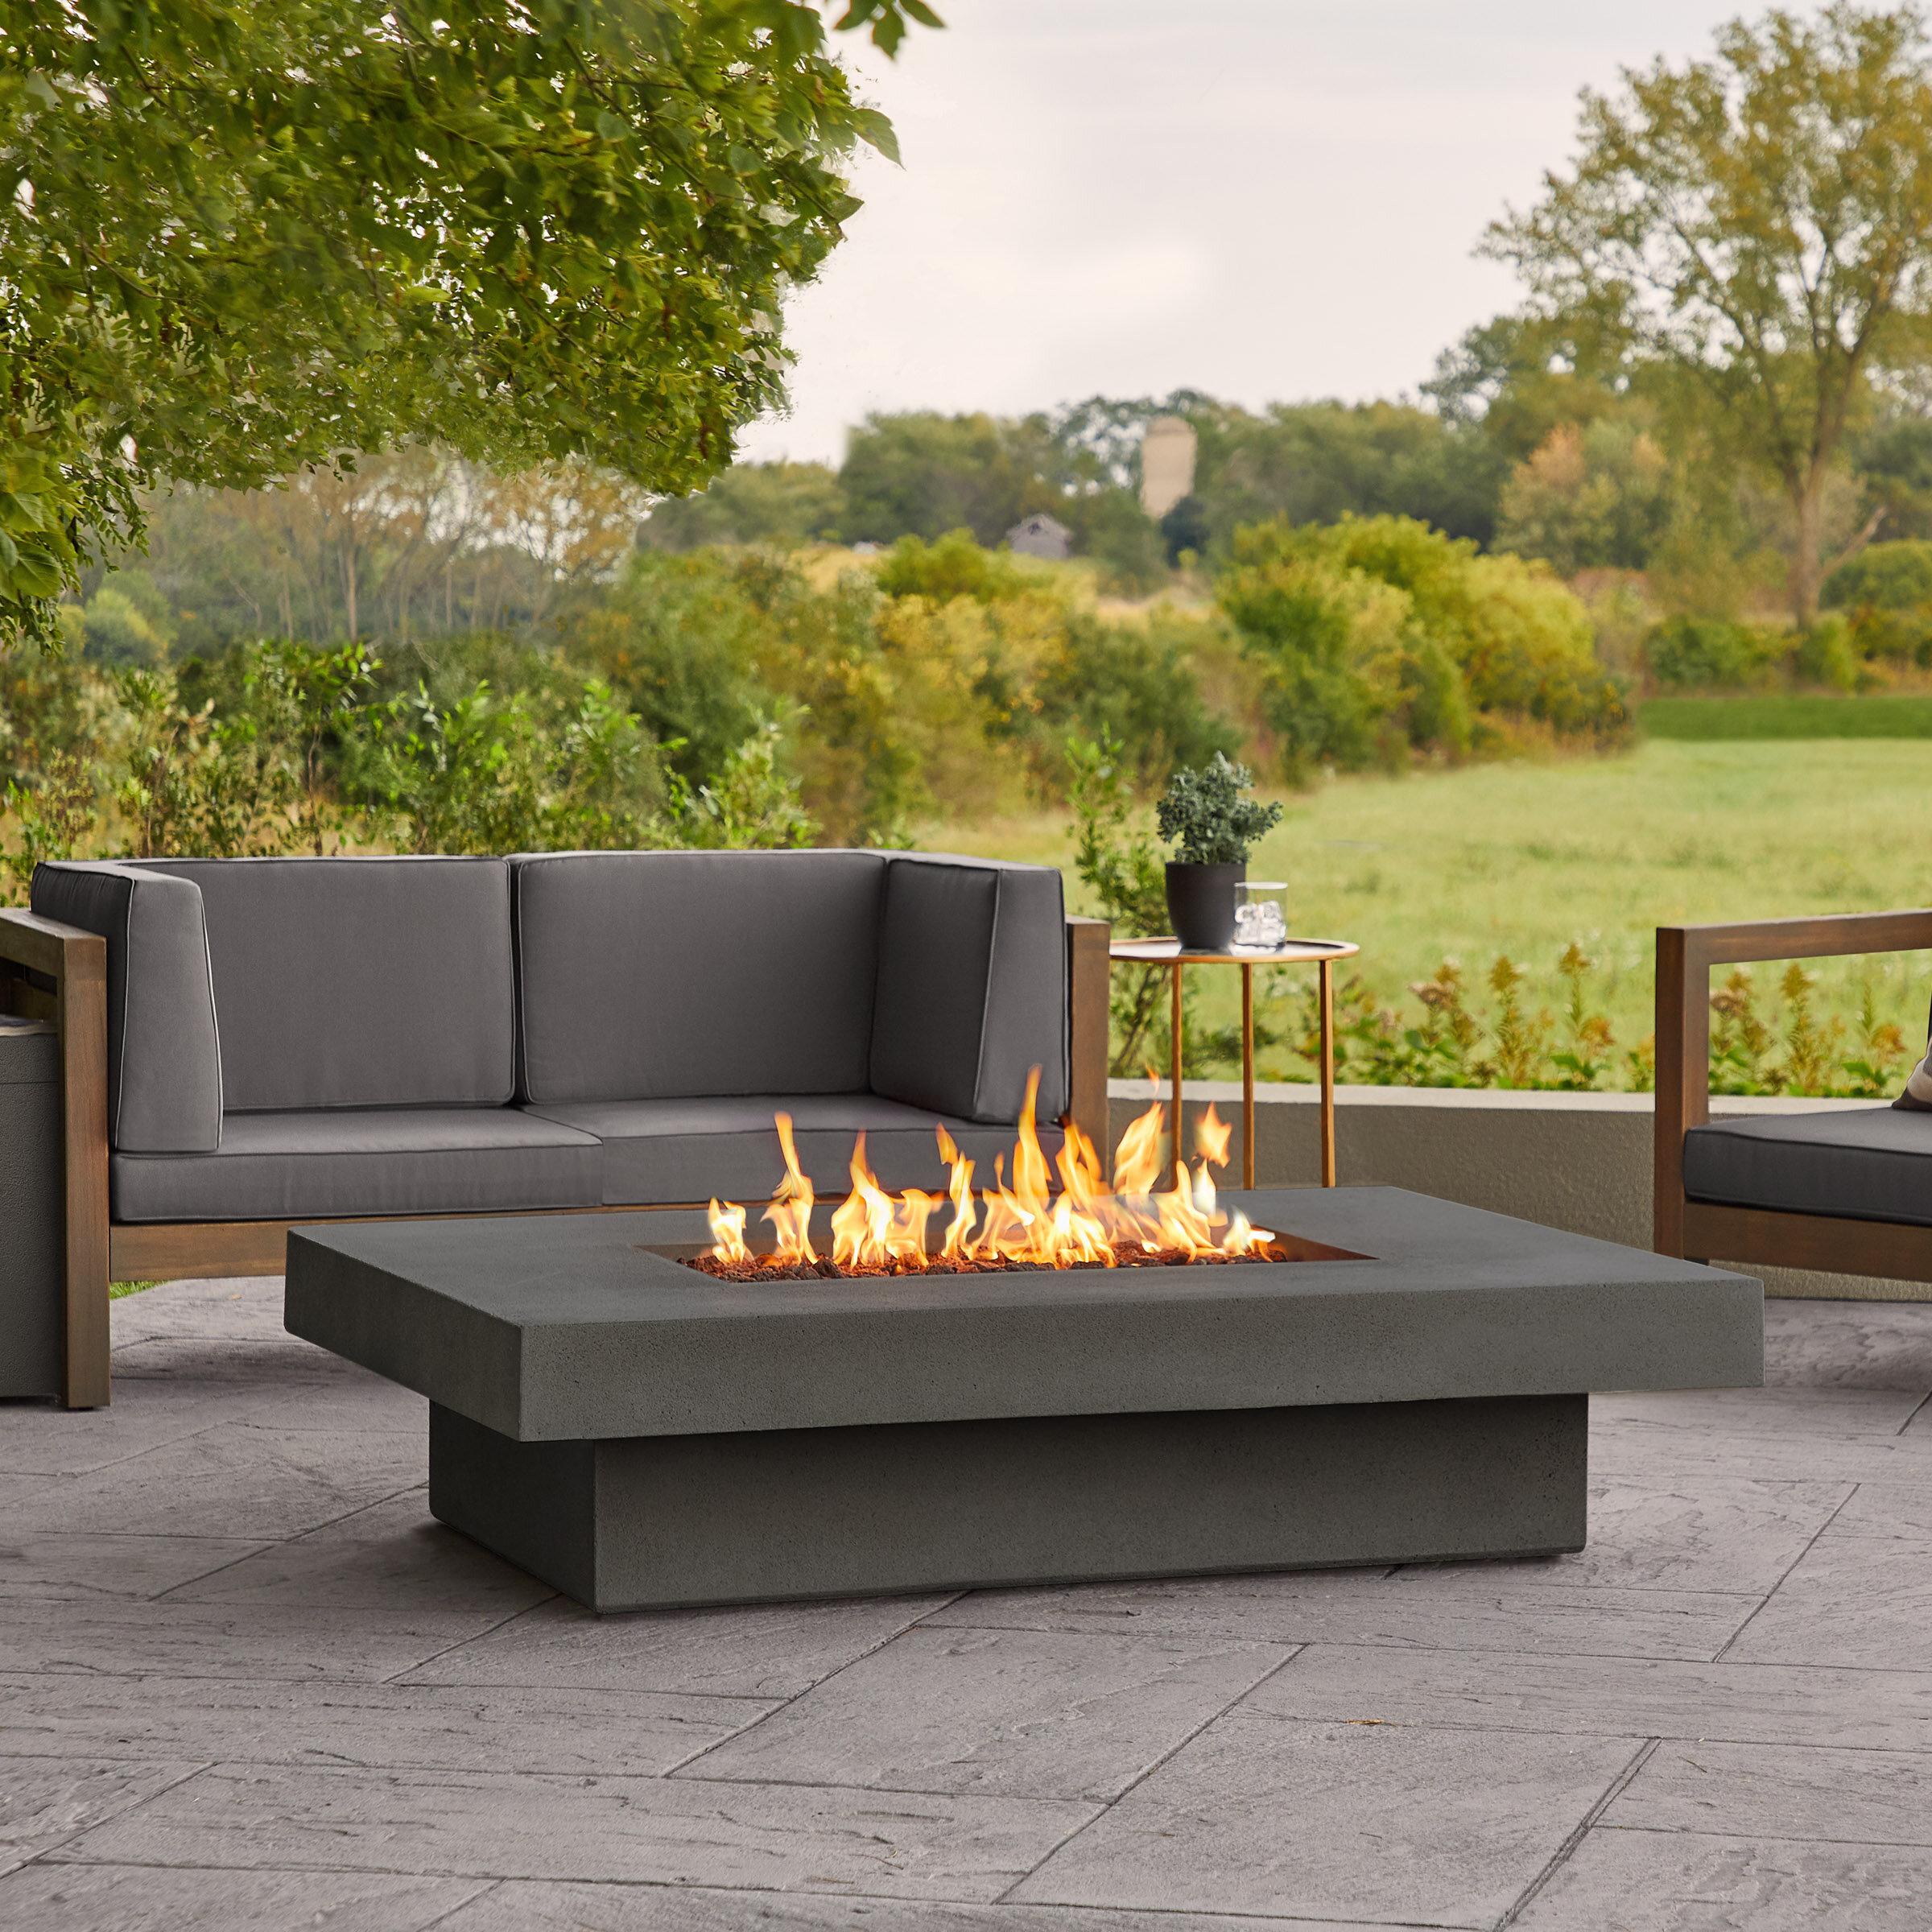 Latitude Run Alazhia Concrete Propane Fire Pit Table Reviews Wayfair